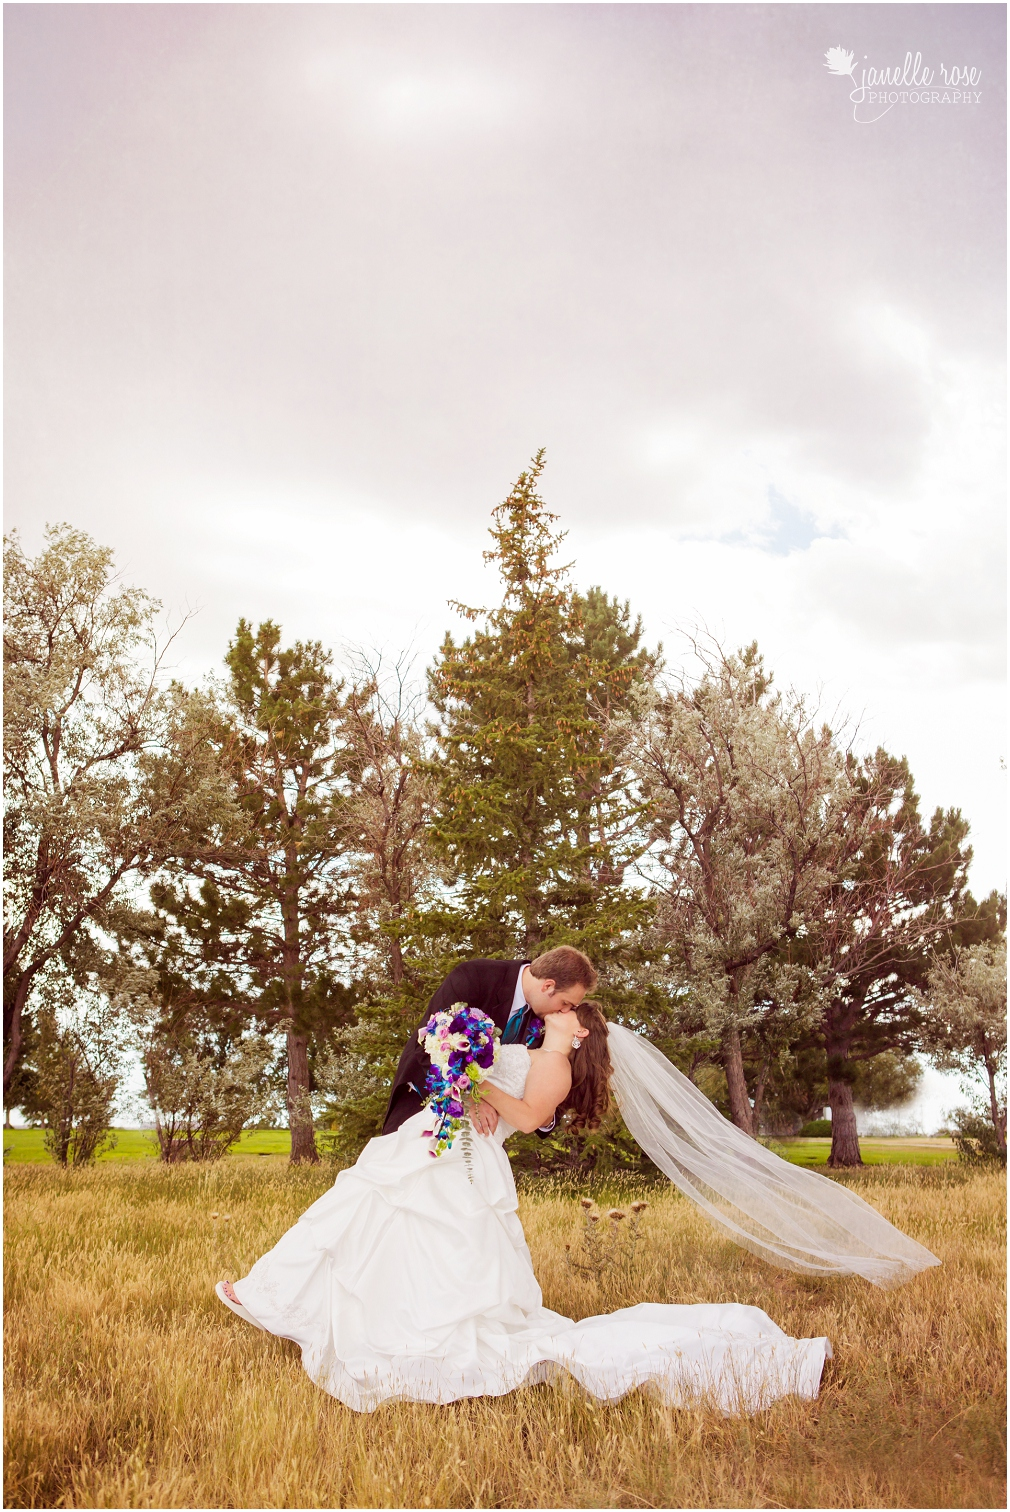 Kaleigh Amp Brady Cheyenne Wyoming Wedding Photographer